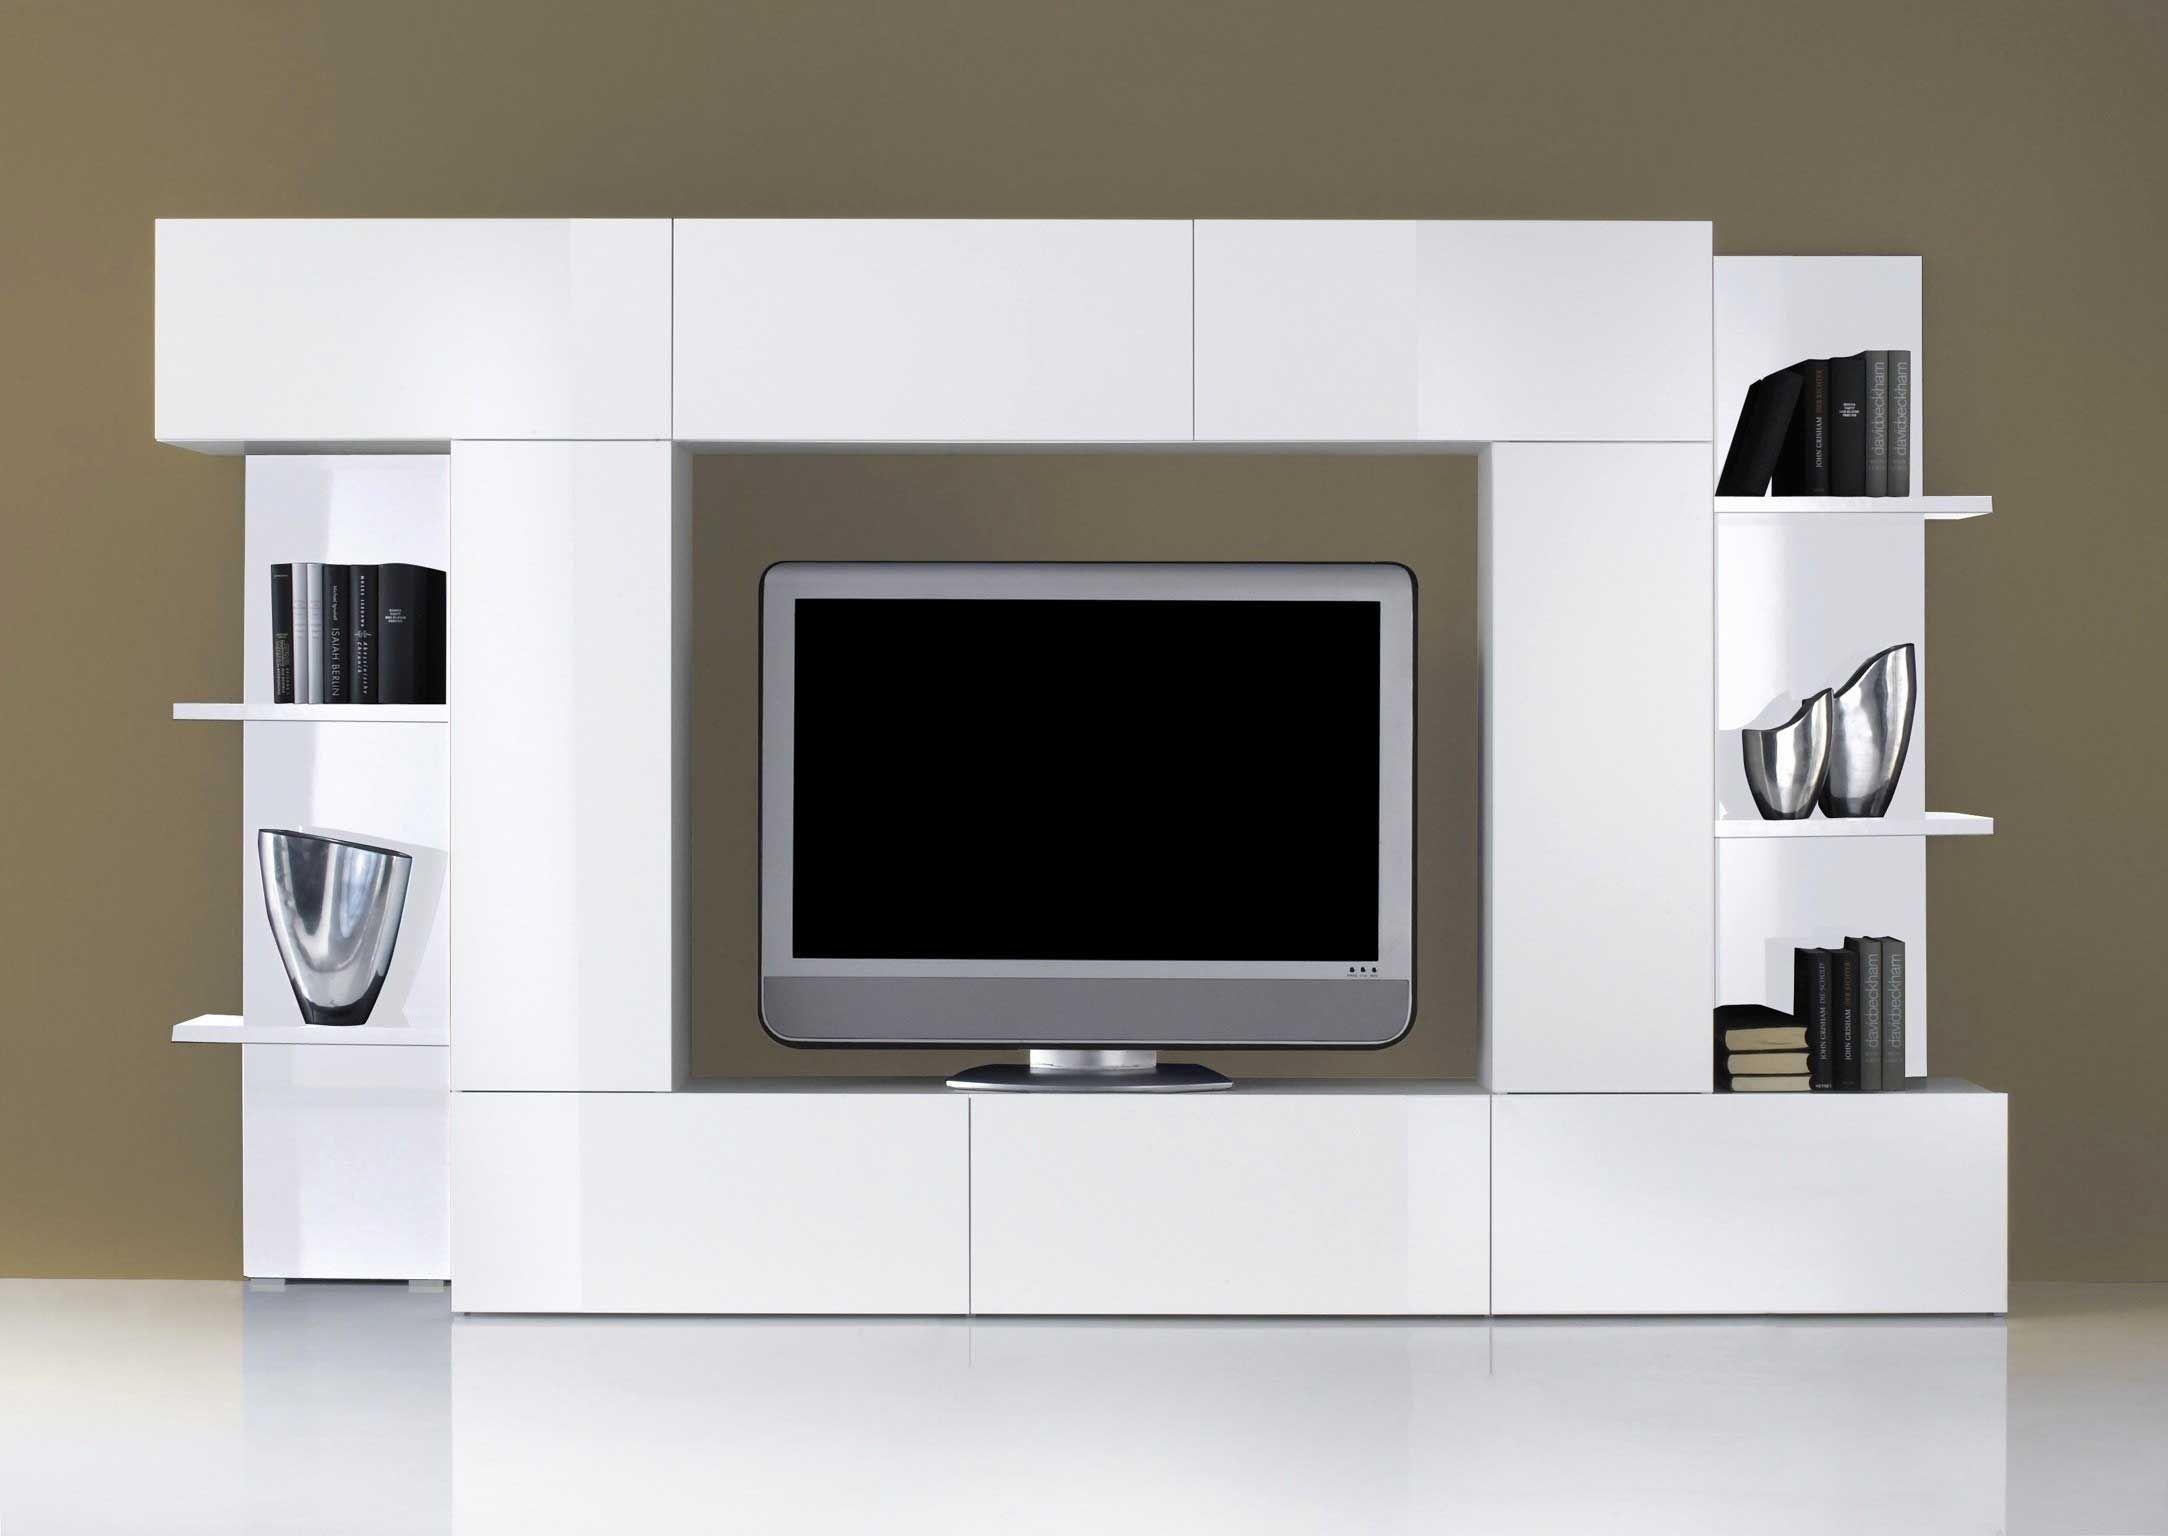 Meuble D Angle Tv Design Inspirant Meuble D Angle Moderne Download Meuble Tv De Coin Tout Sur En 2020 Meuble Tv Design Meuble Tv Meuble Tv Mural Design